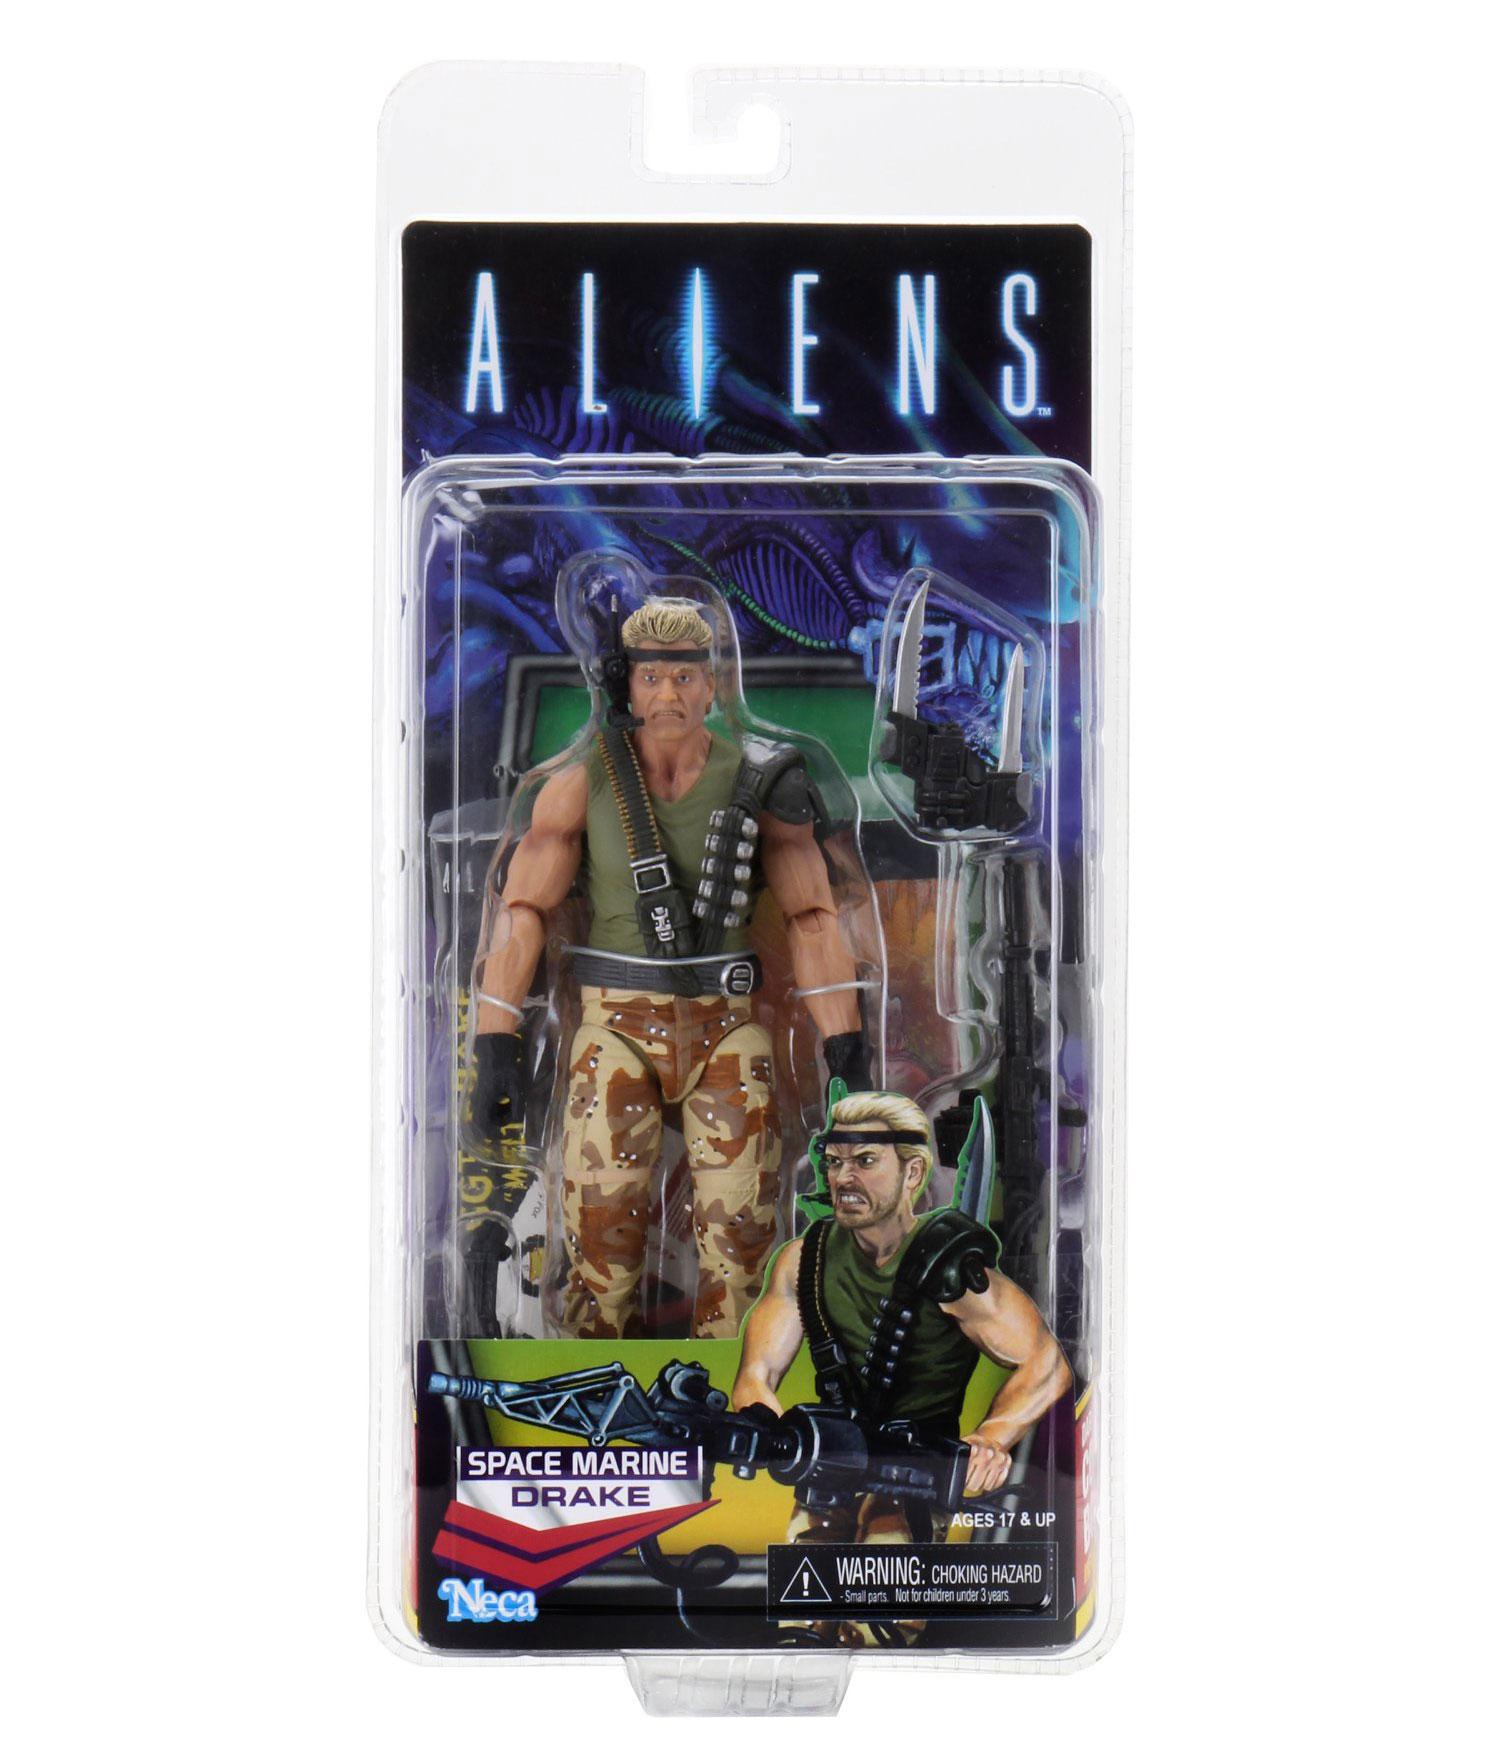 neca-aliens-drake-space-marine-kenner-figure-packaging-front